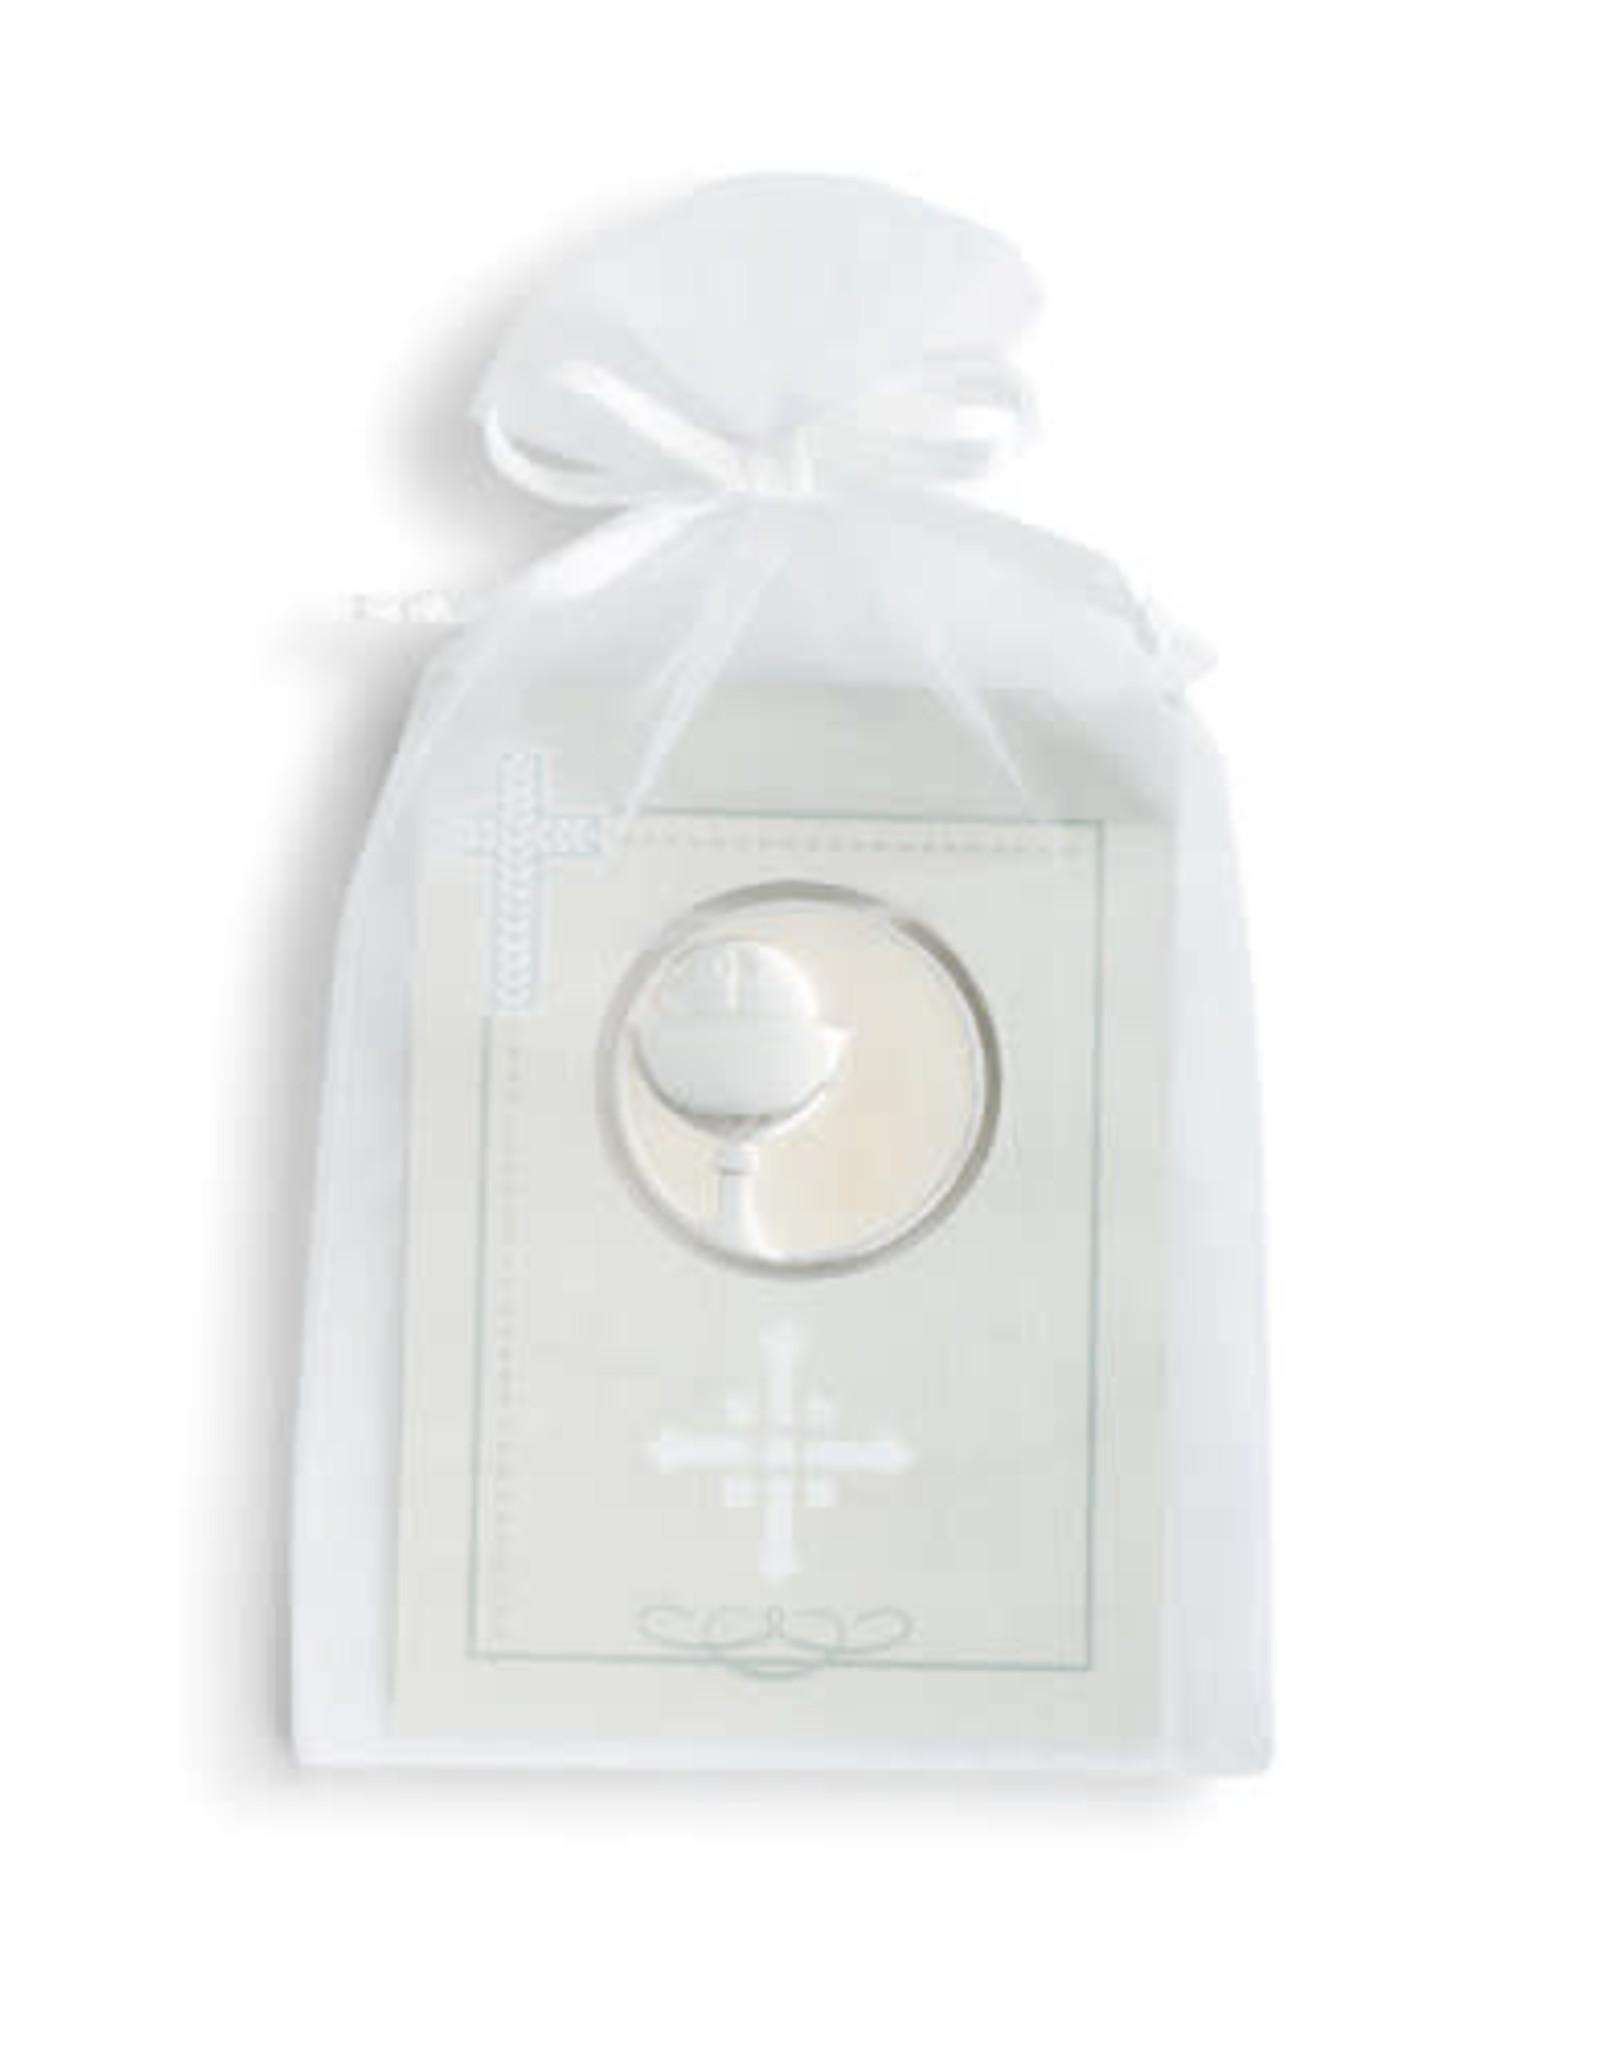 Communion Token Gift Set